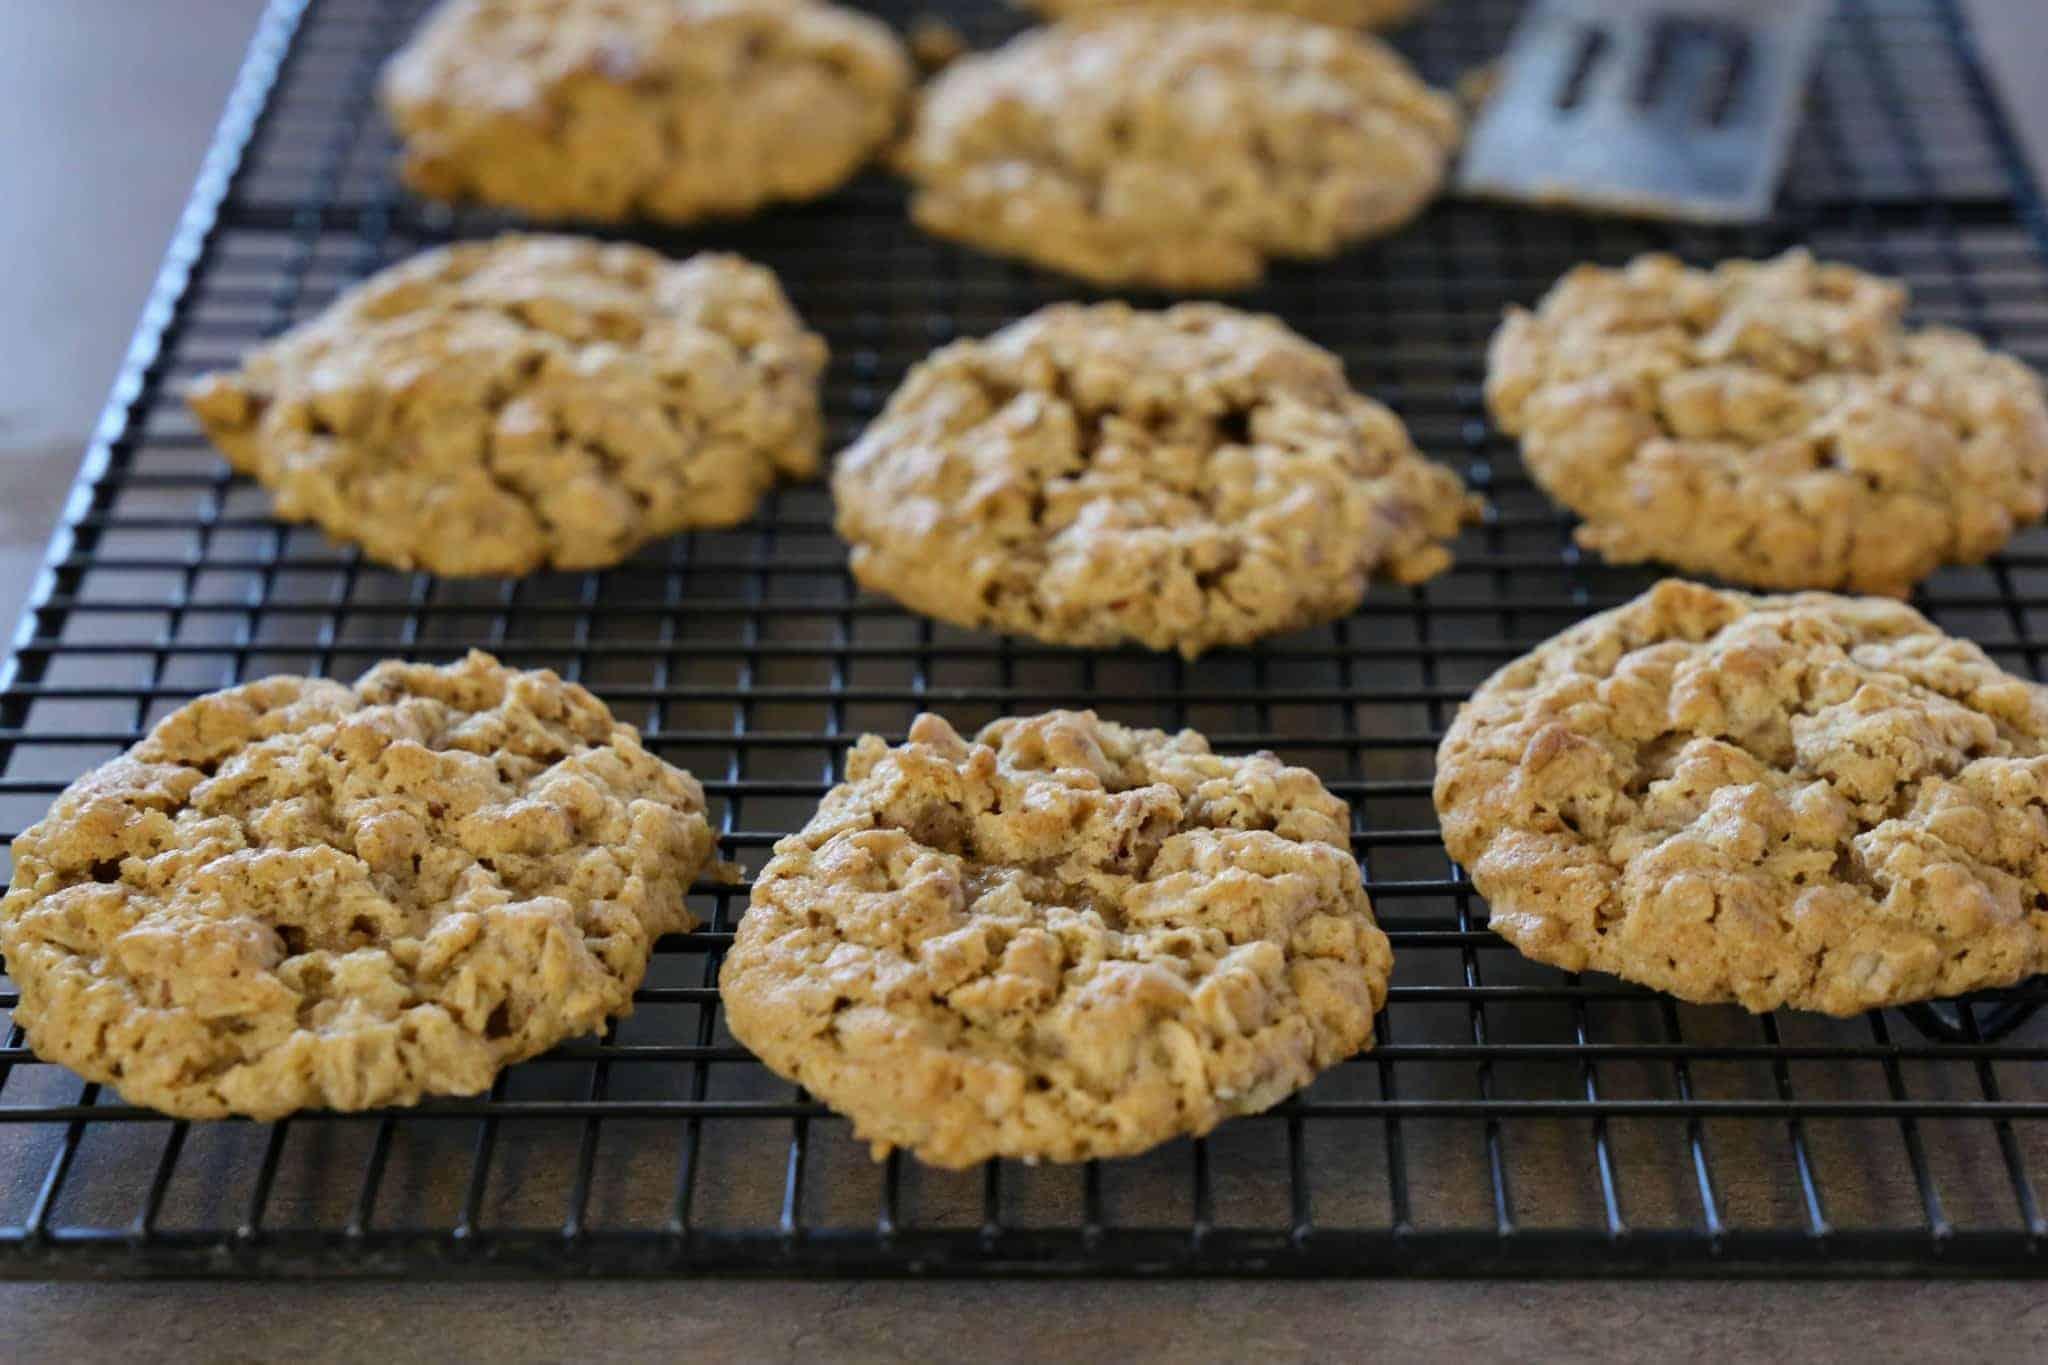 pecan cookies on a wire baking rack